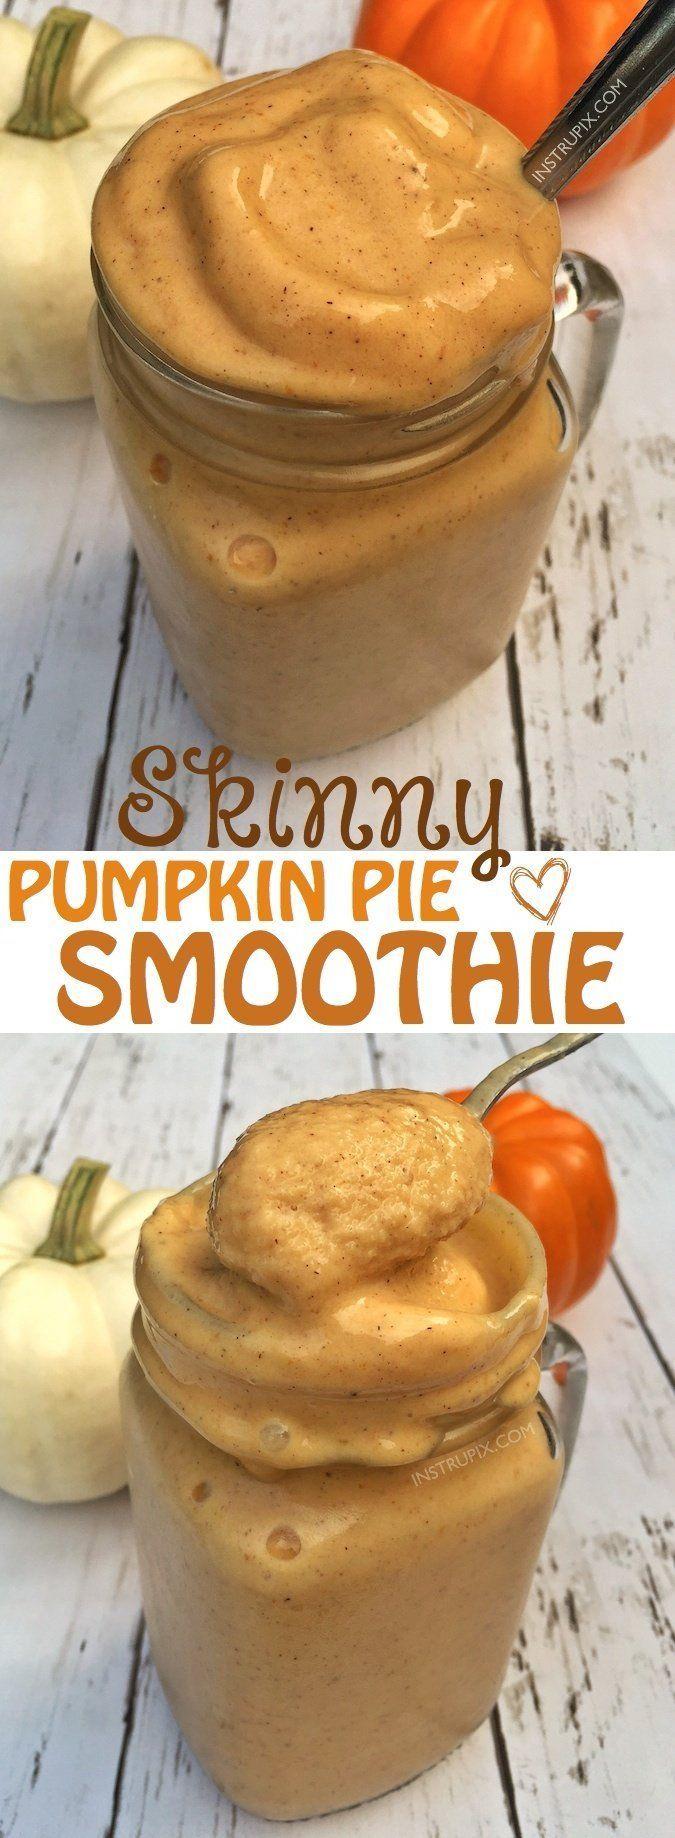 Healthy Pumpkin Pie Smoothie Recipe (SO GOOD!)